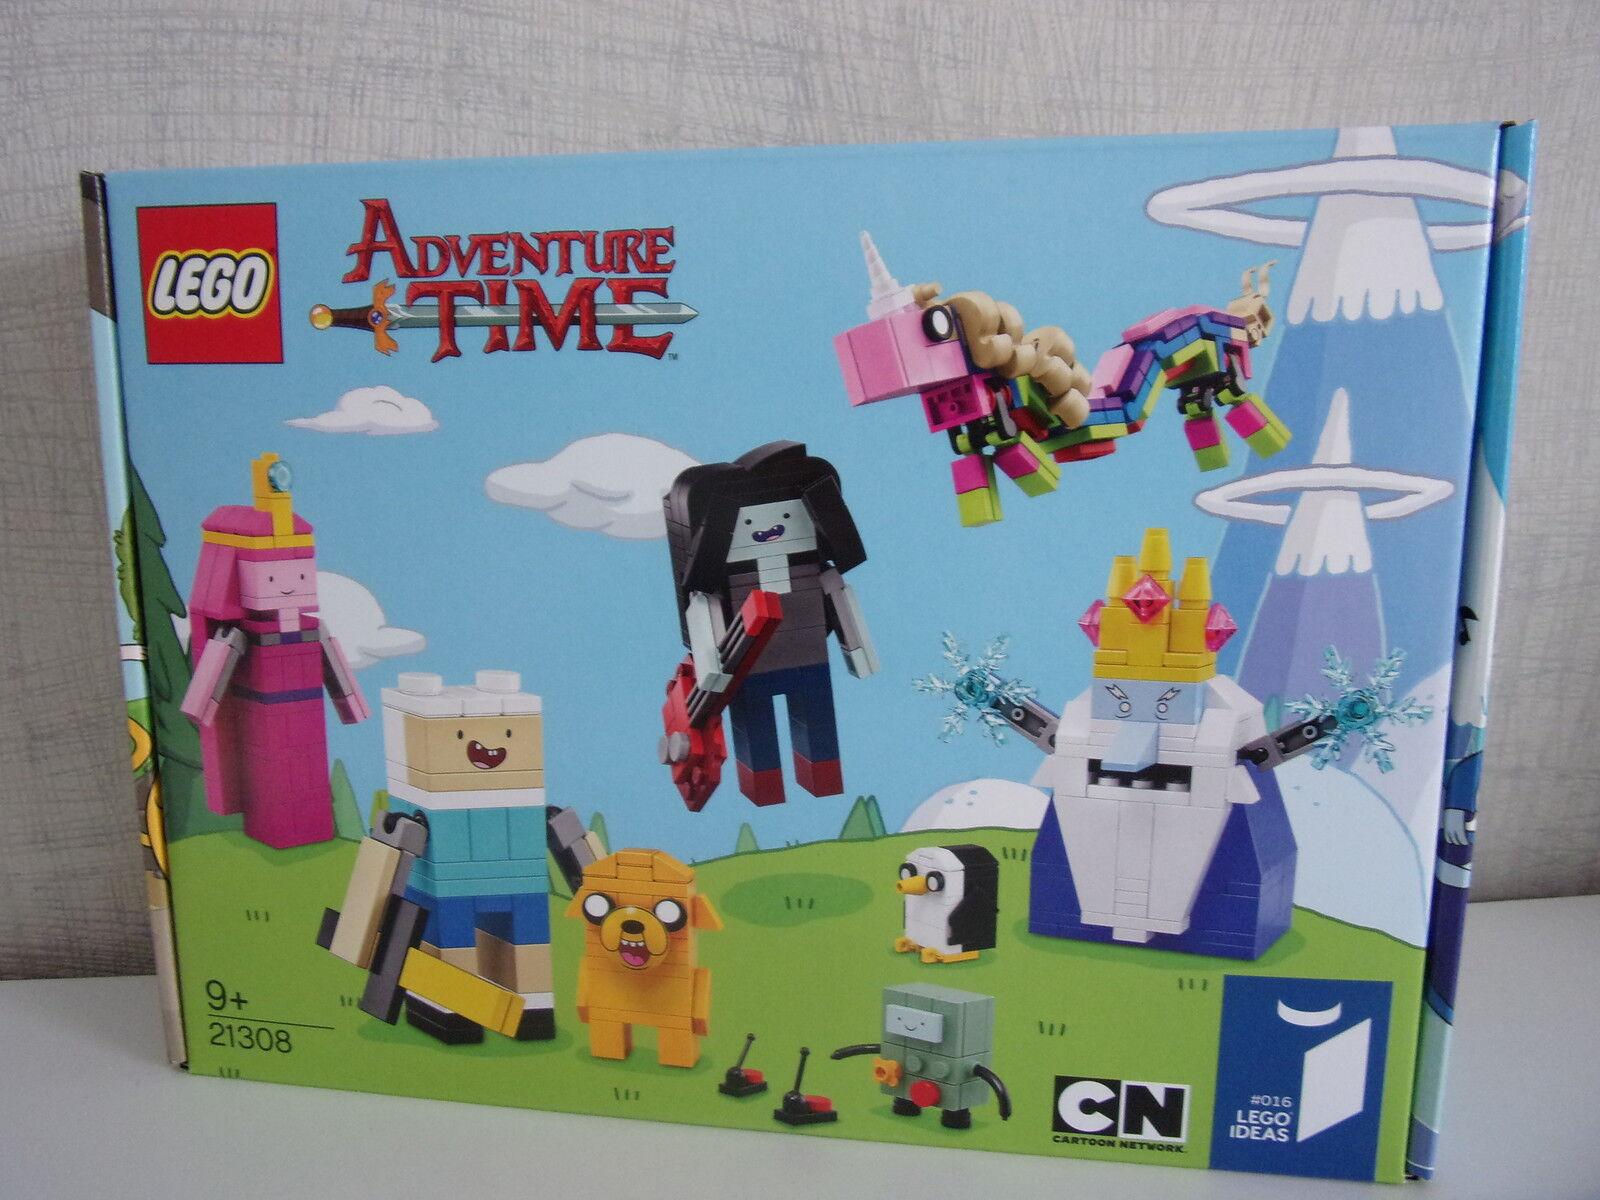 Lego Idées 21308 Adventure Time - Neuf et Emballage D'Origine